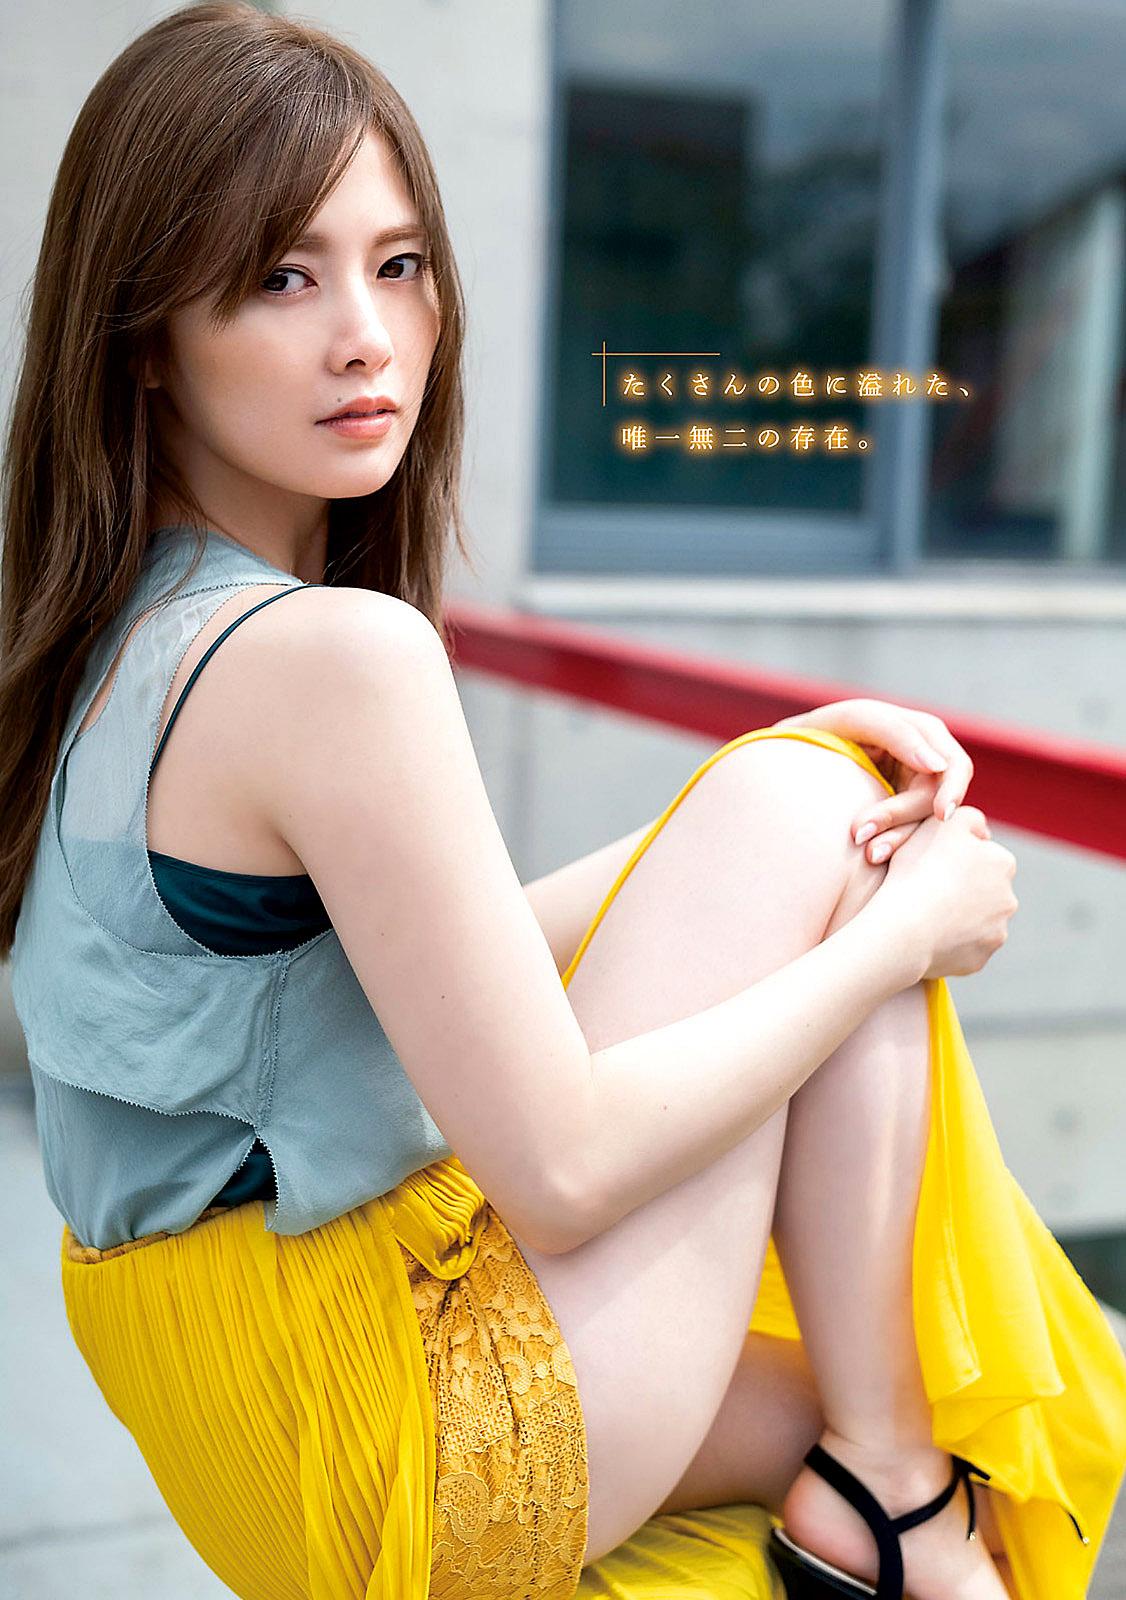 MShiraishi Young Magazine 200504 06.jpg